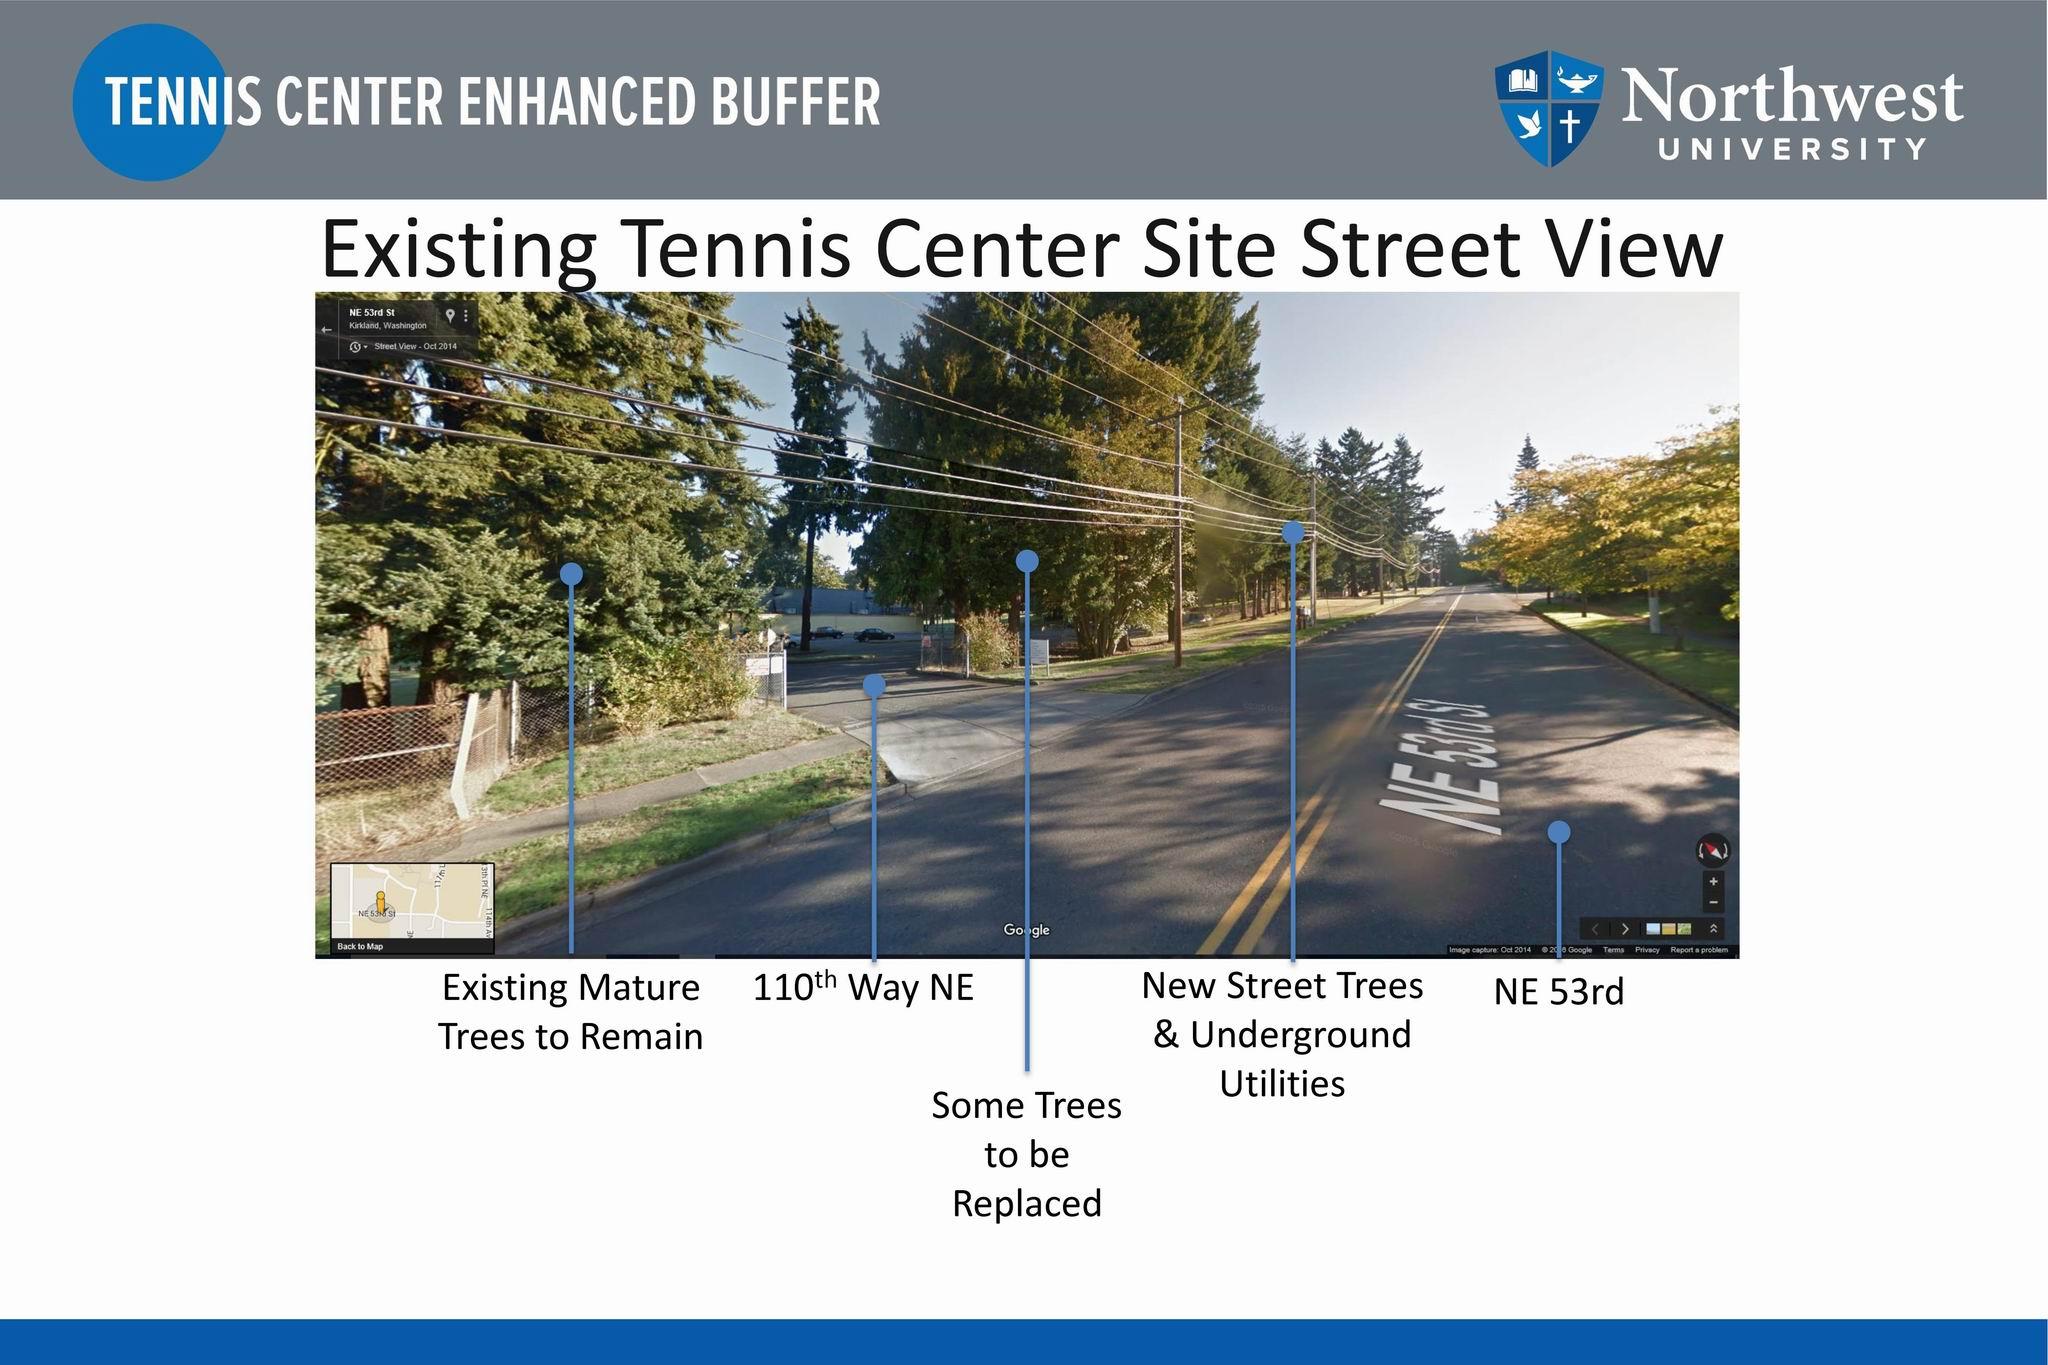 Tennis Center Existing Street View